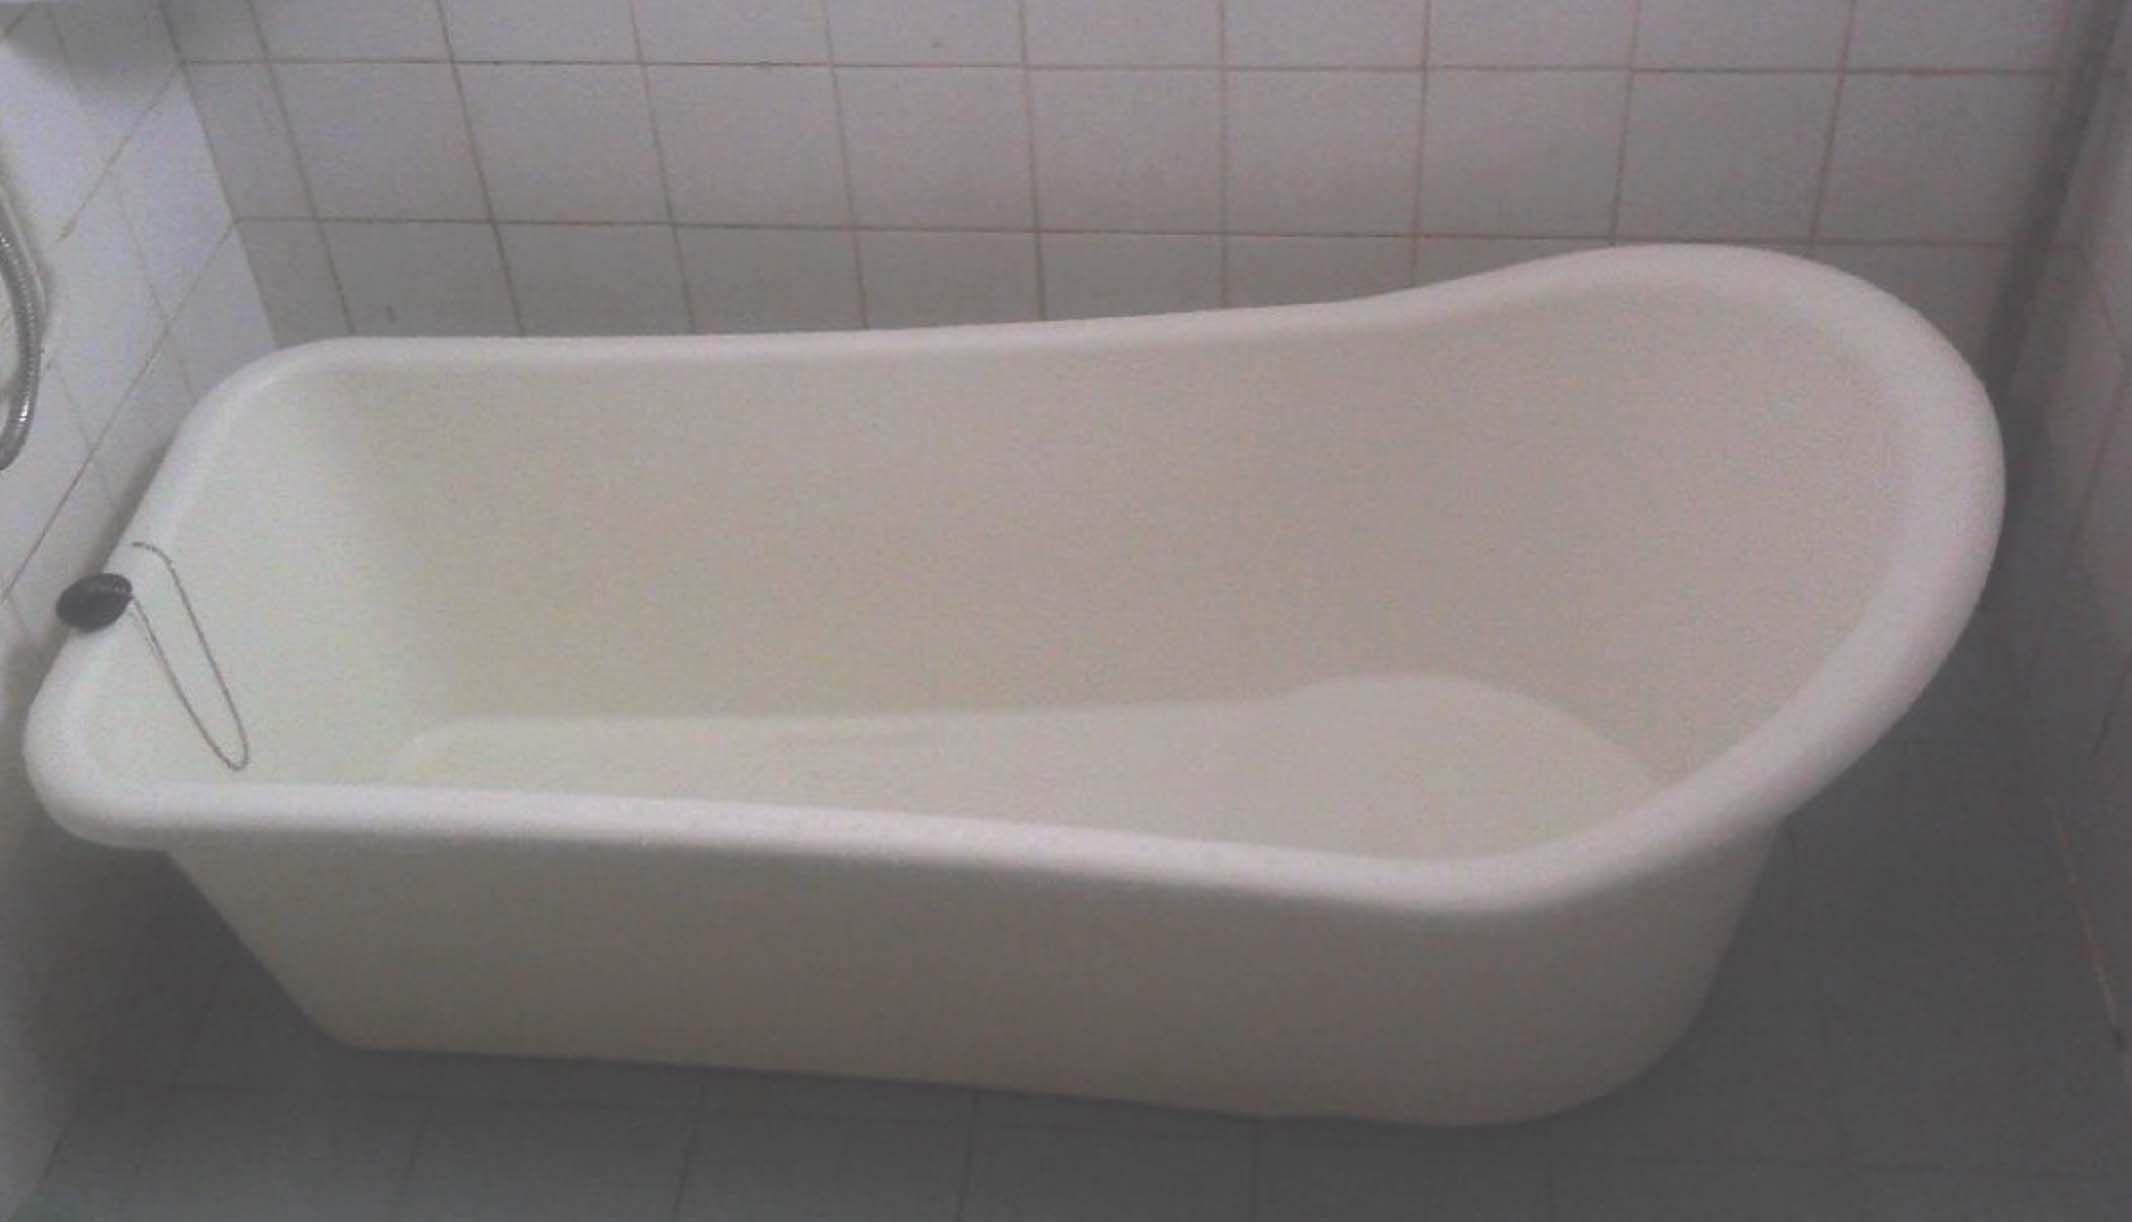 Adult Portable Bathtub Household Pinterest Portable